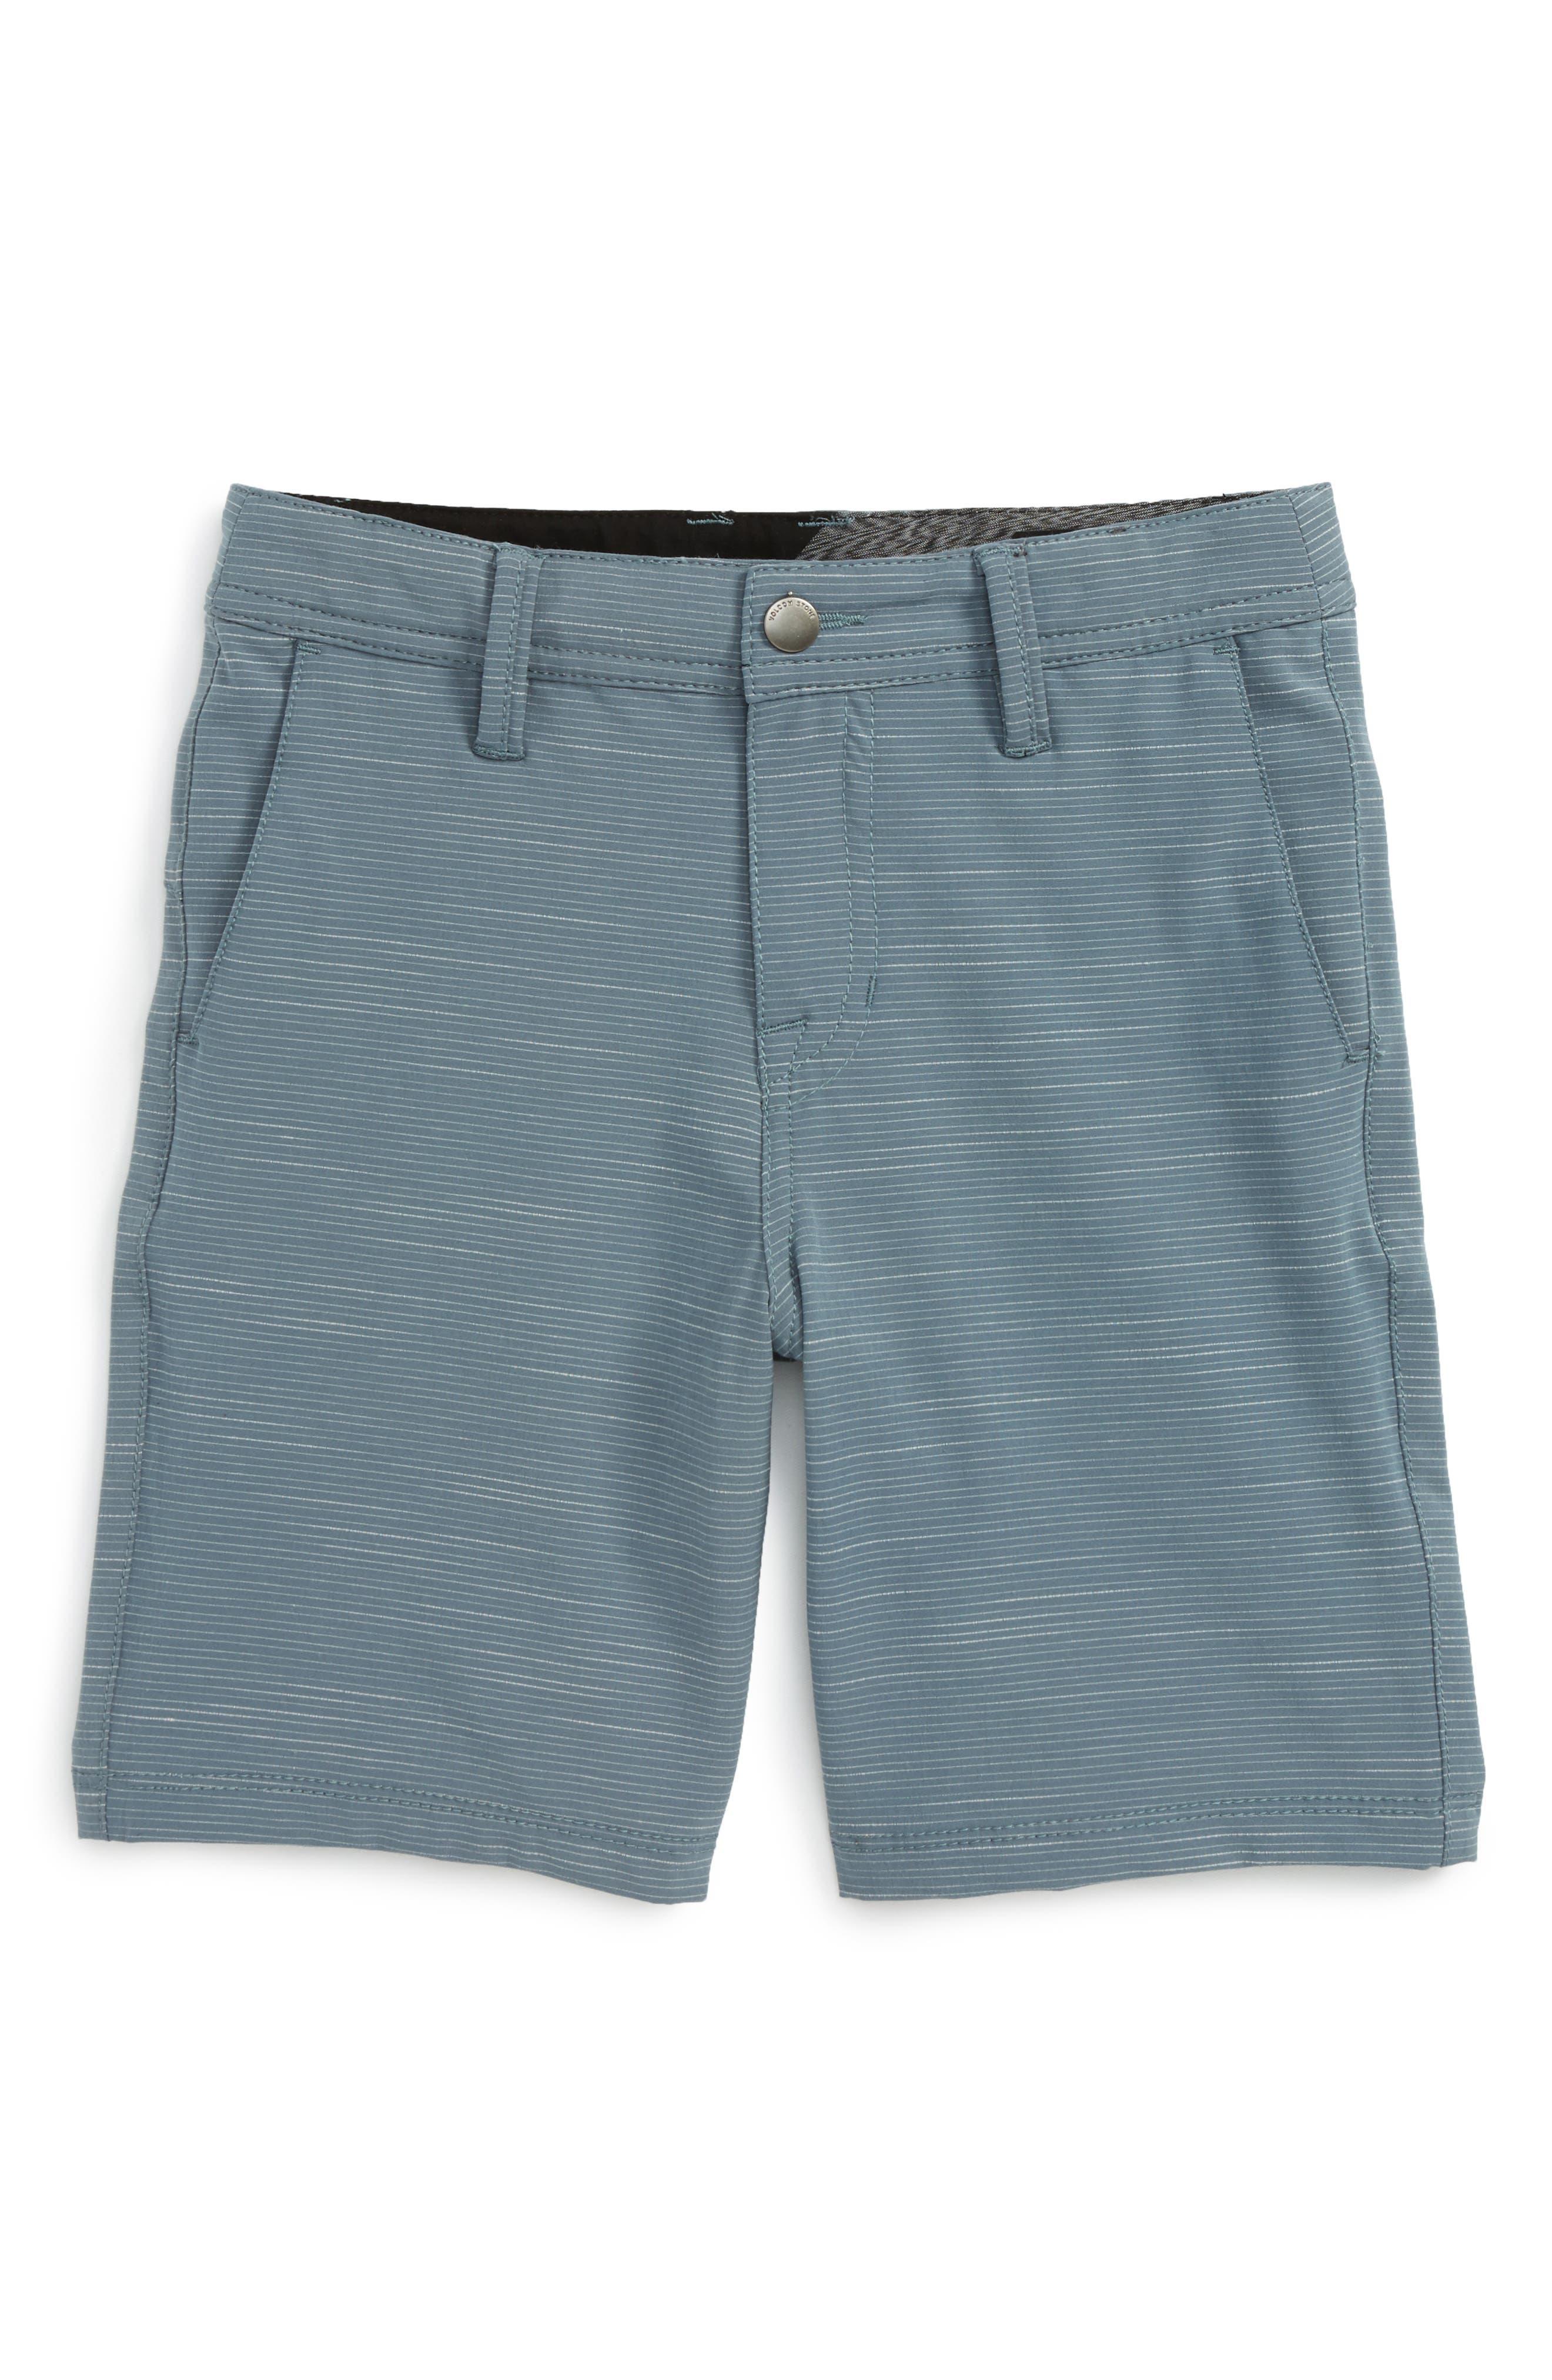 Volcom Surf N' Turf Hybrid Shorts (Toddler Boys & Little Boys)